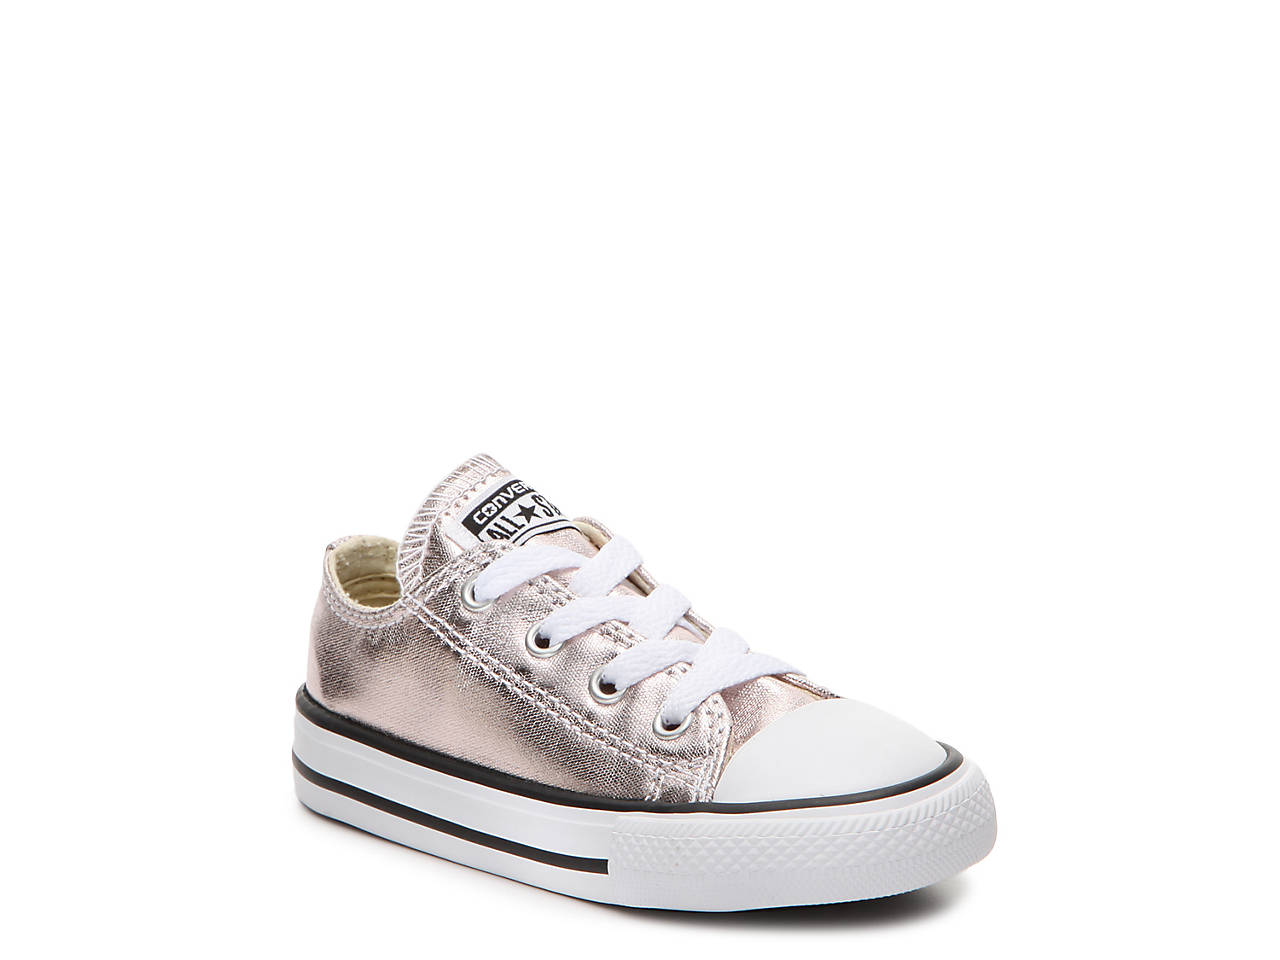 f27eaca8182 Converse Chuck Taylor All Star Metallic Toddler Sneaker Kids Shoes